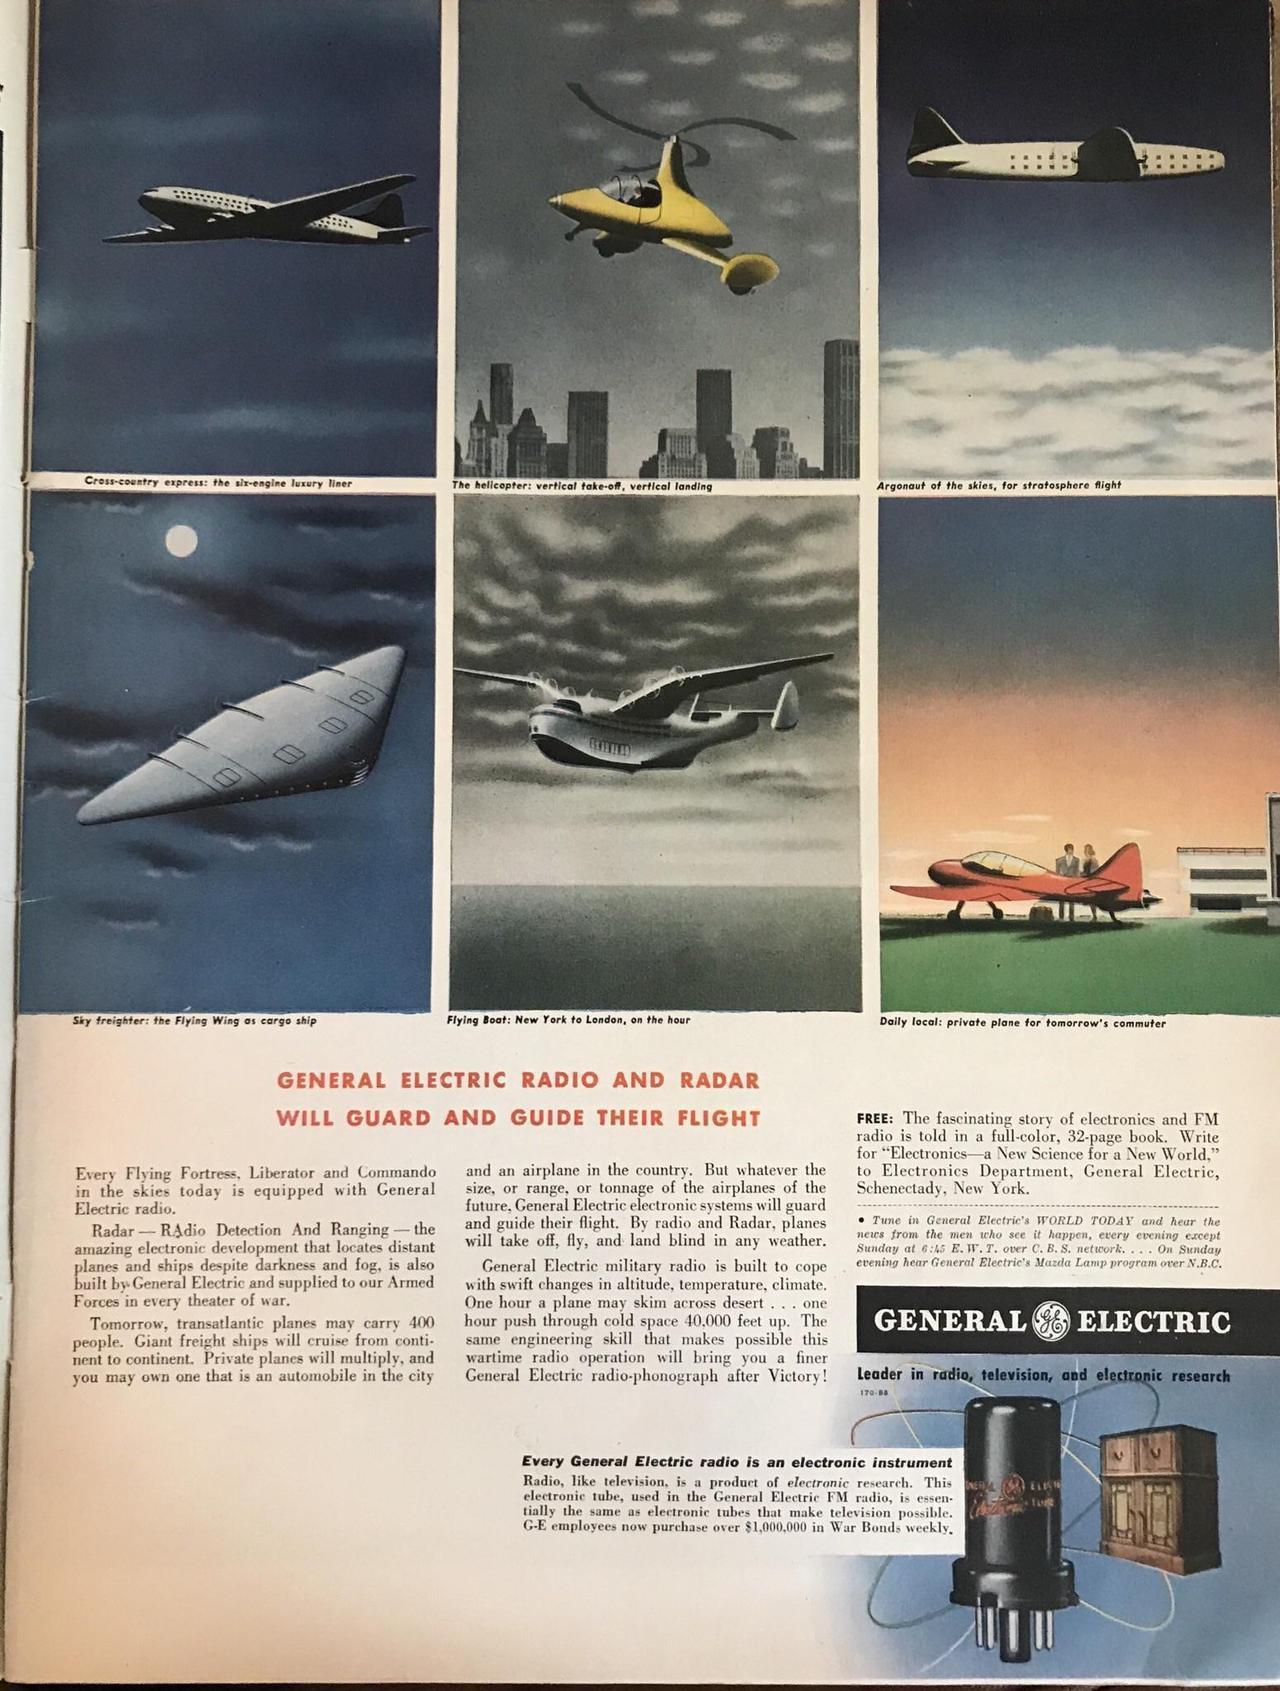 A retro-futuristic GE ad from a 1943 Life Magazine - Vintage